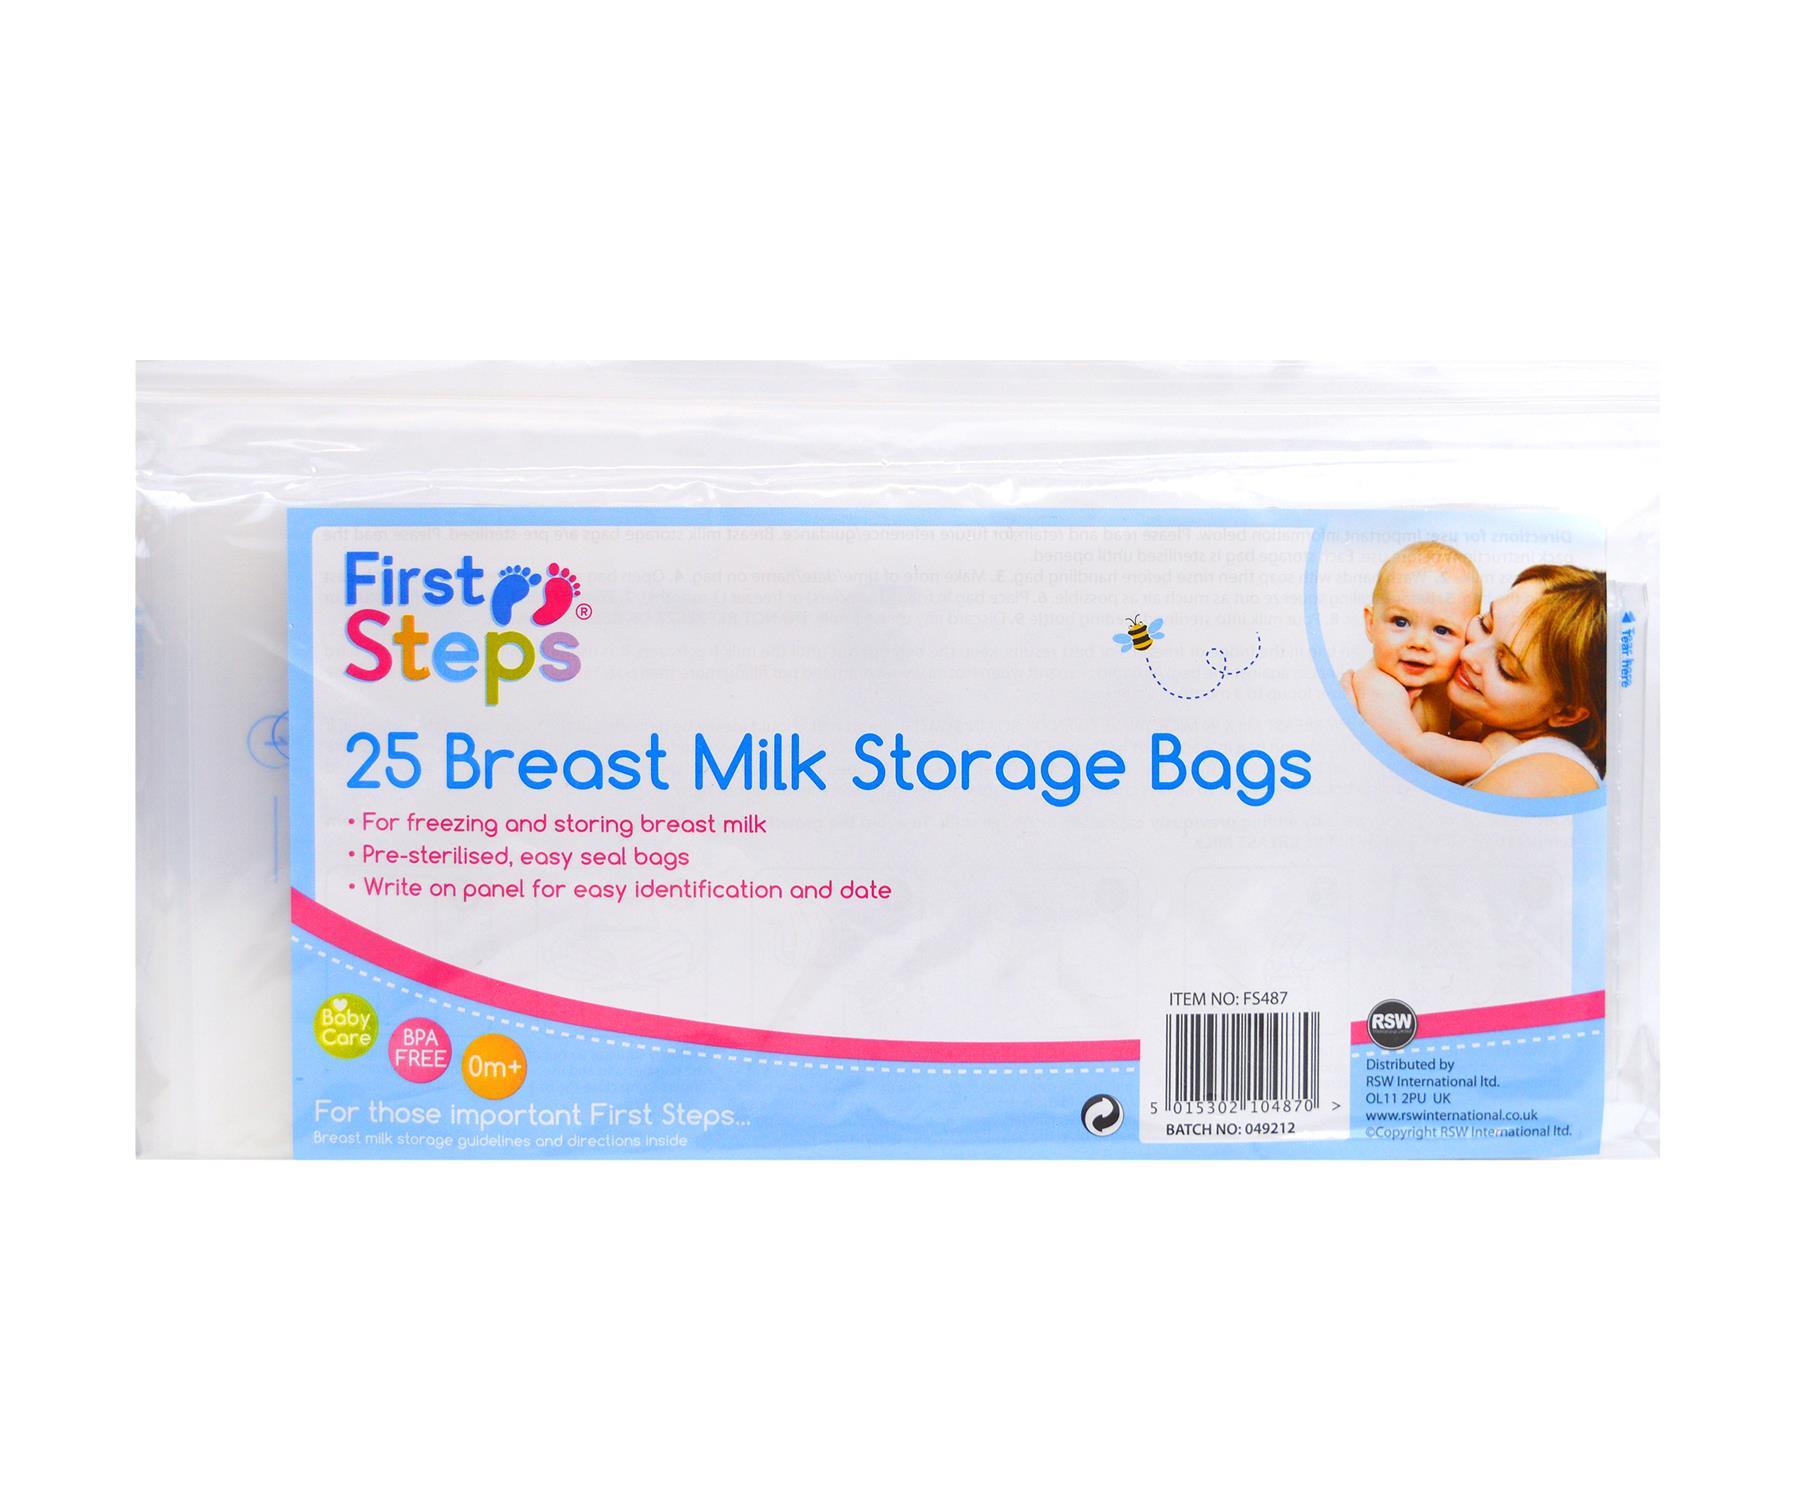 Breast Milk Storage Bags Freezer Pre Sterilised Easy Seal Storage Containers